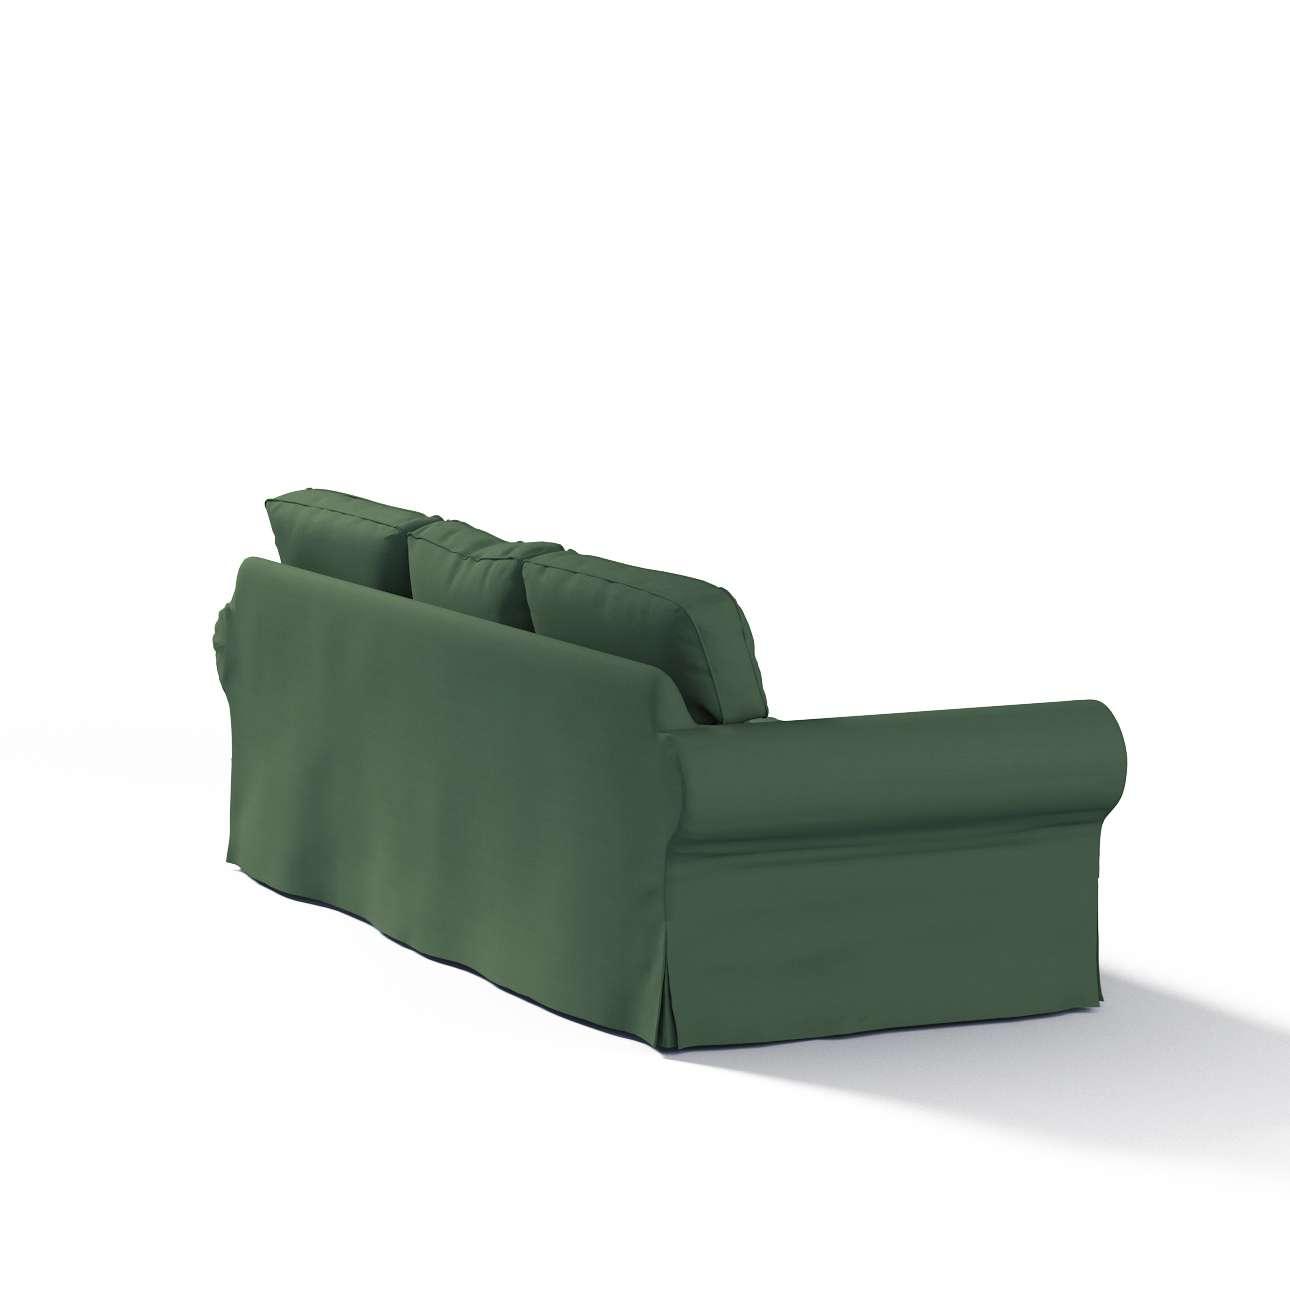 Ektorp 3-Sitzer Schlafsofabezug, ALTES Modell Sofahusse Ektorp 3-Sitzer Schlafsofa von der Kollektion Cotton Panama, Stoff: 702-06